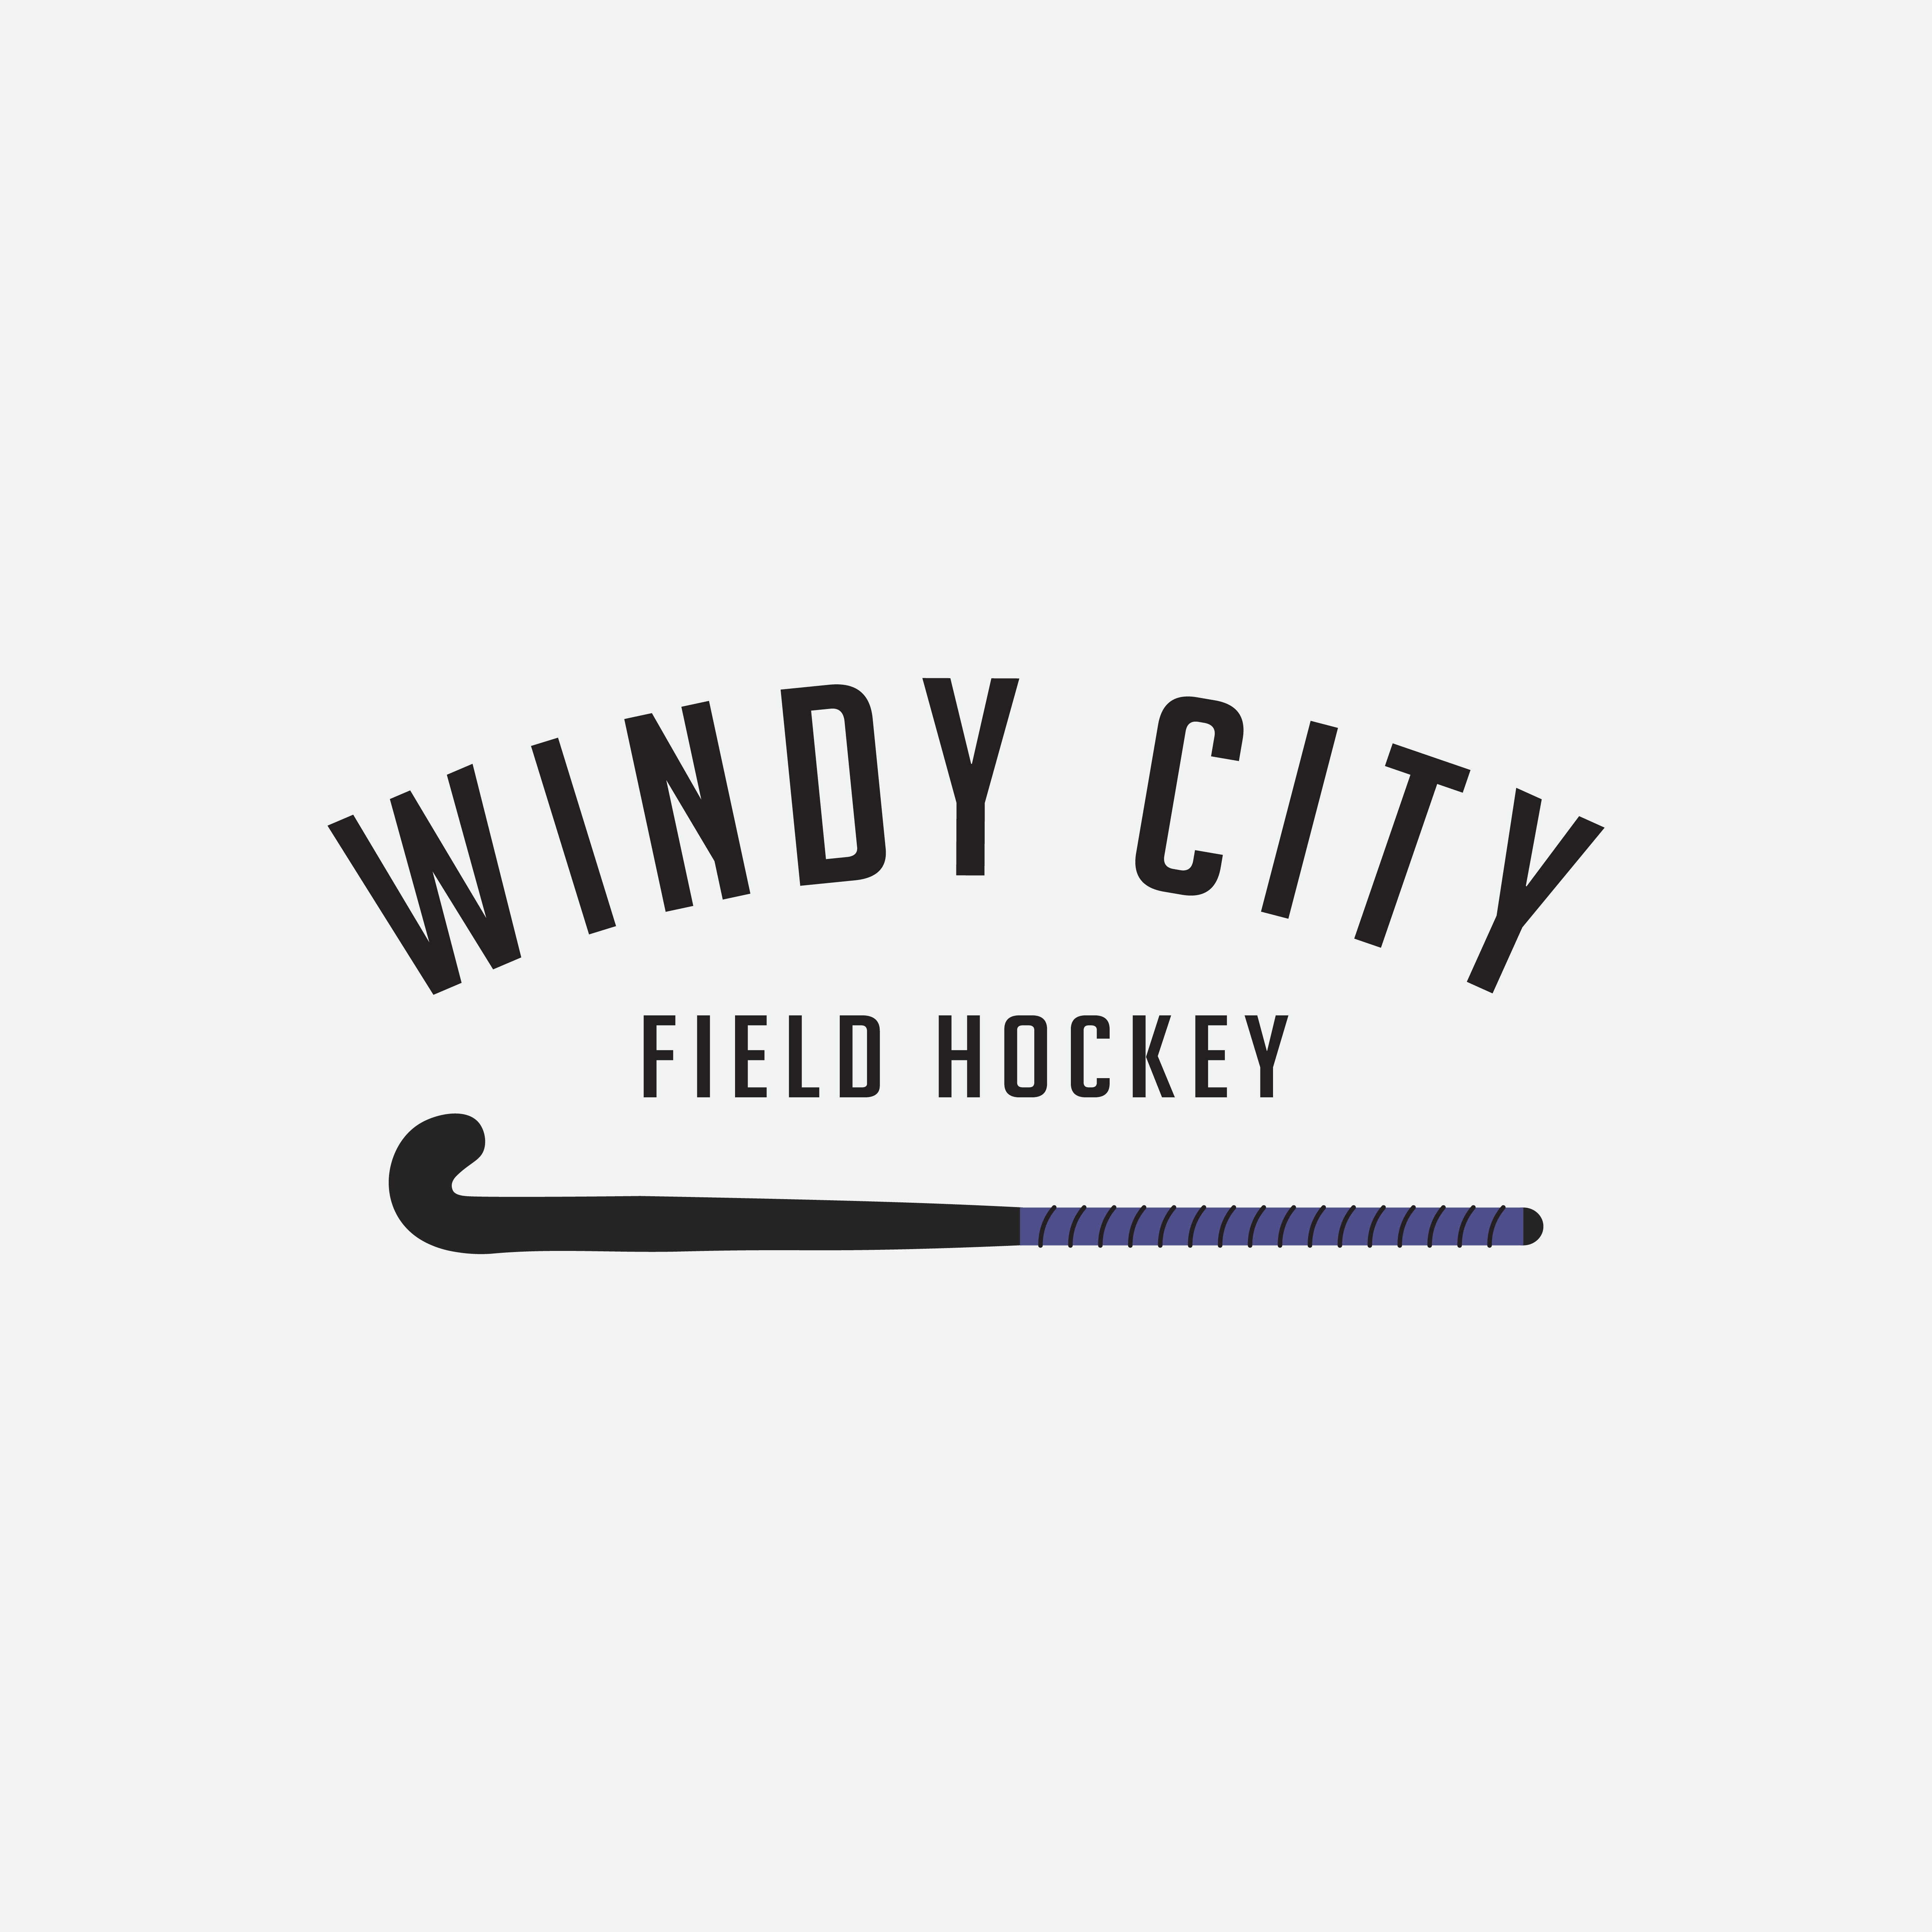 Windy City Field Hockey Logo Designed By Amari Creative Windycity Fieldhockey Amari Am Creative Branding Design Branding Design Studio Creative Branding